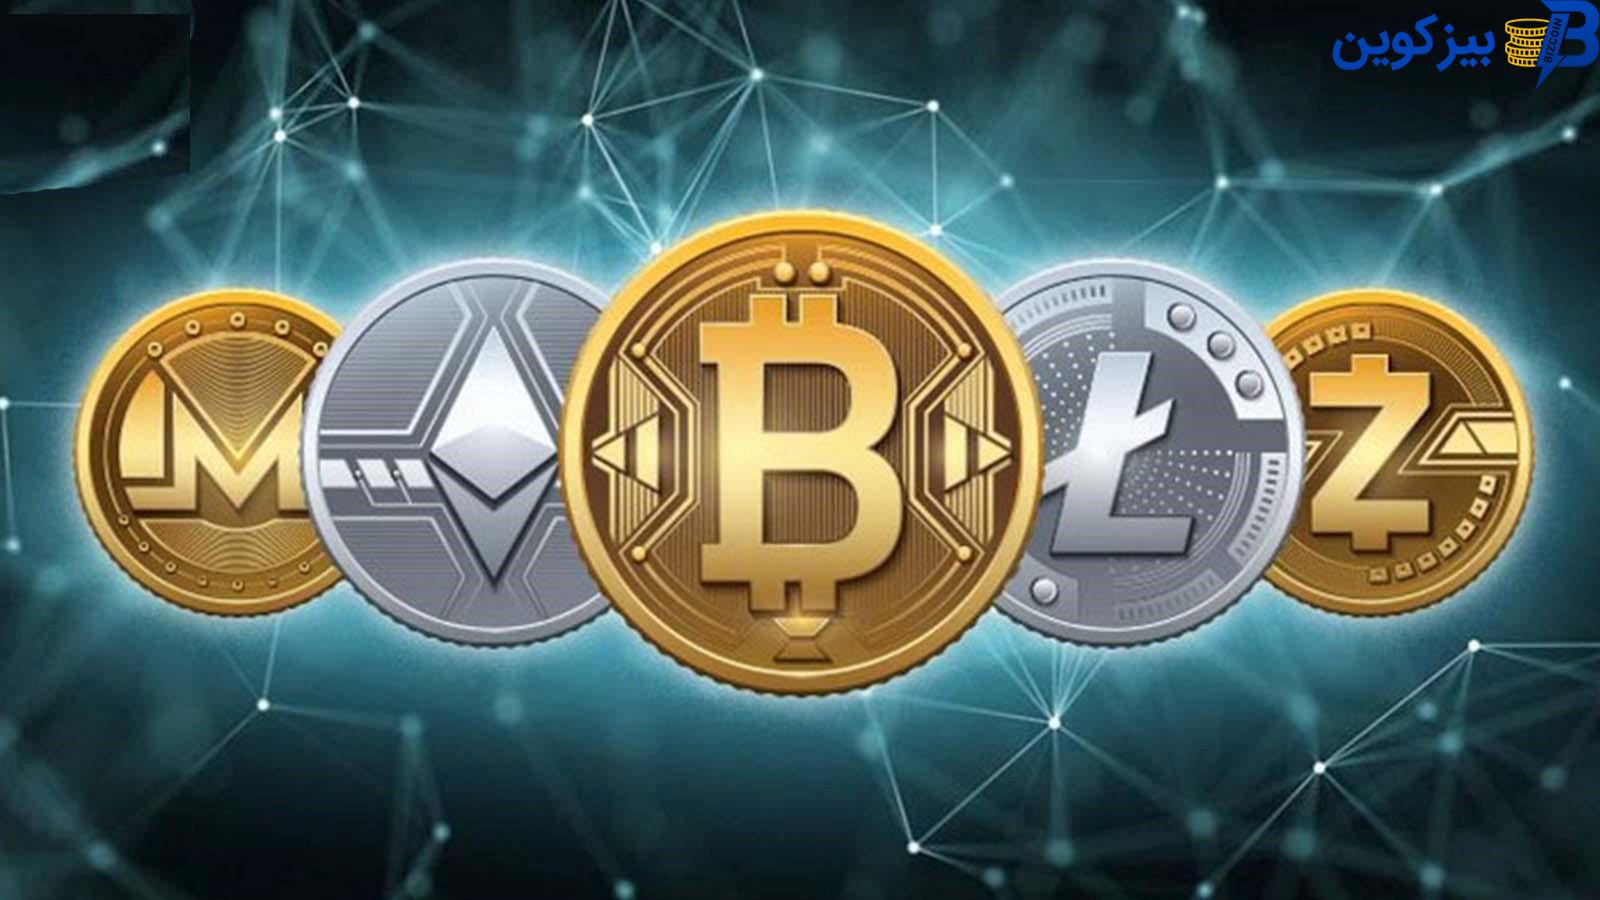 crypto currency services دنیای بزرگ خدمات ارزهای دیجیتال